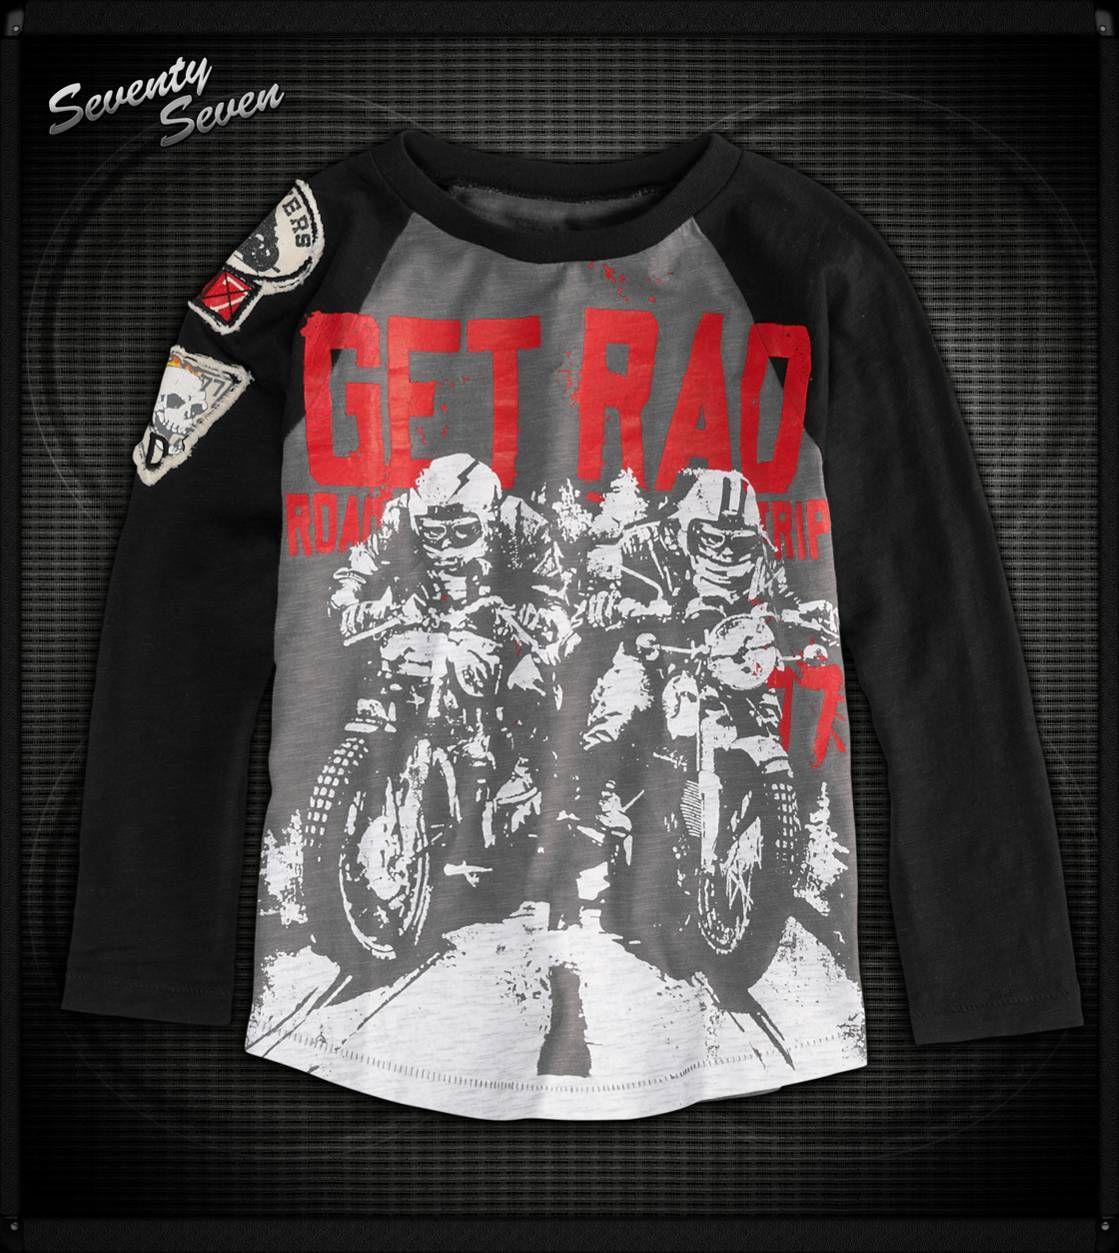 77 Kids Get Rad Bmx Shirt 77kids Boys Getrad Bmx Motorcross